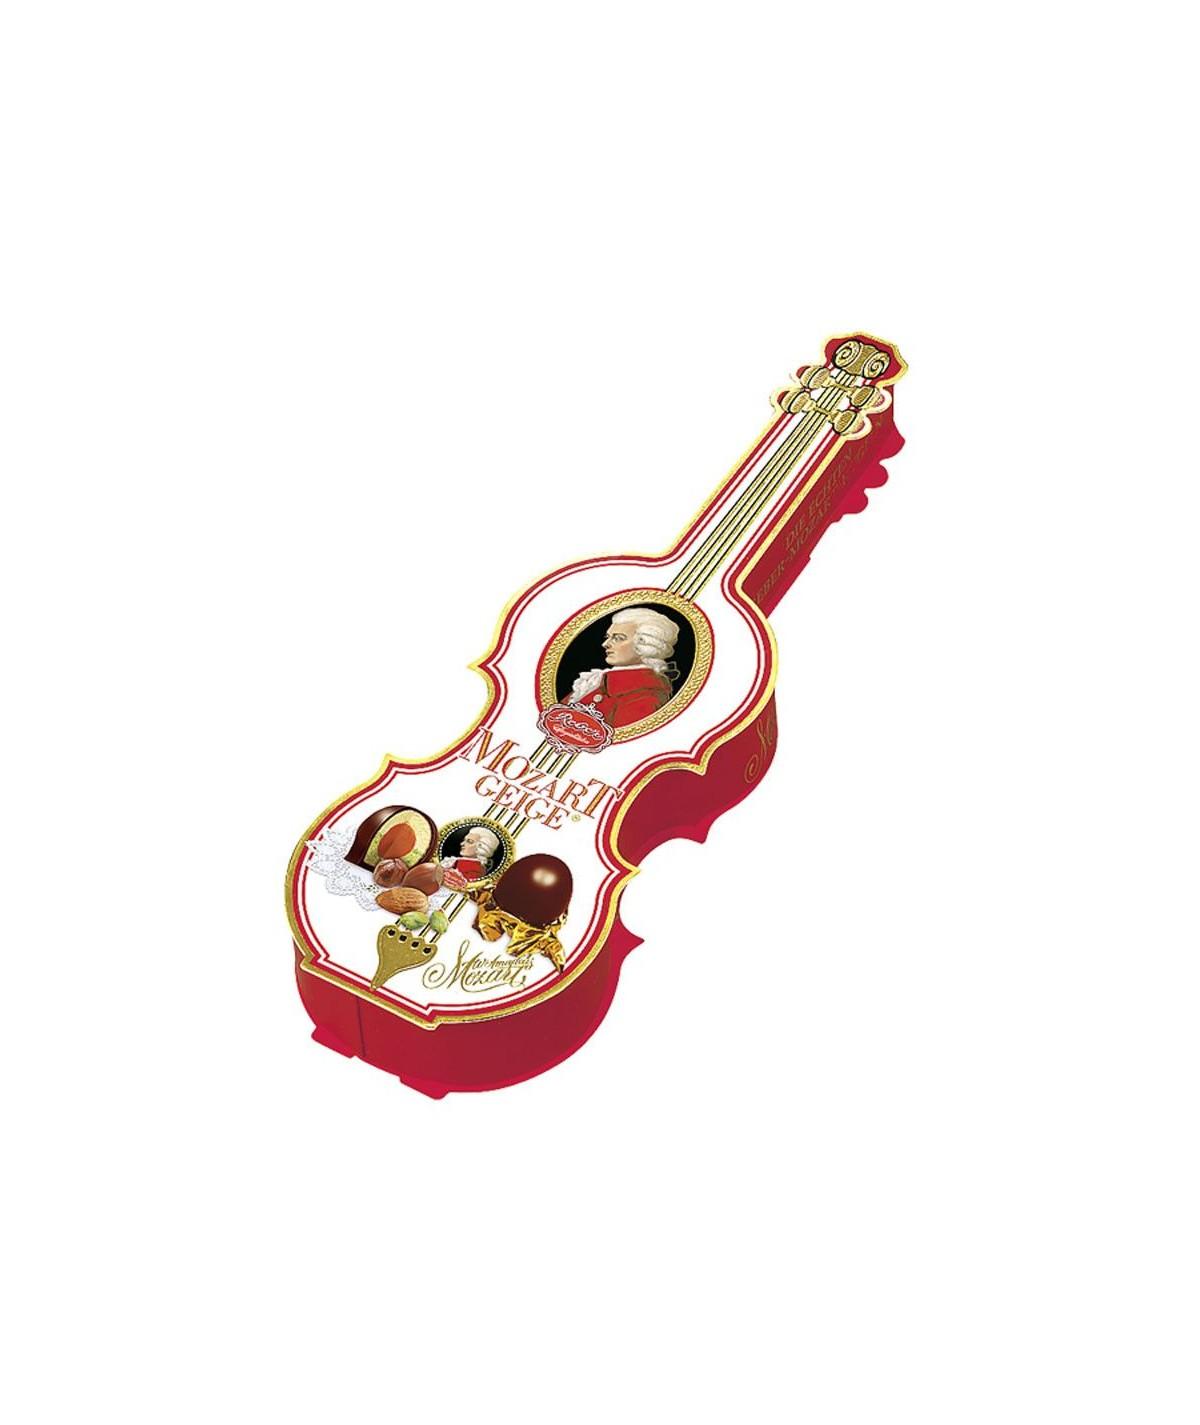 Mozart-Geige Reber 140g